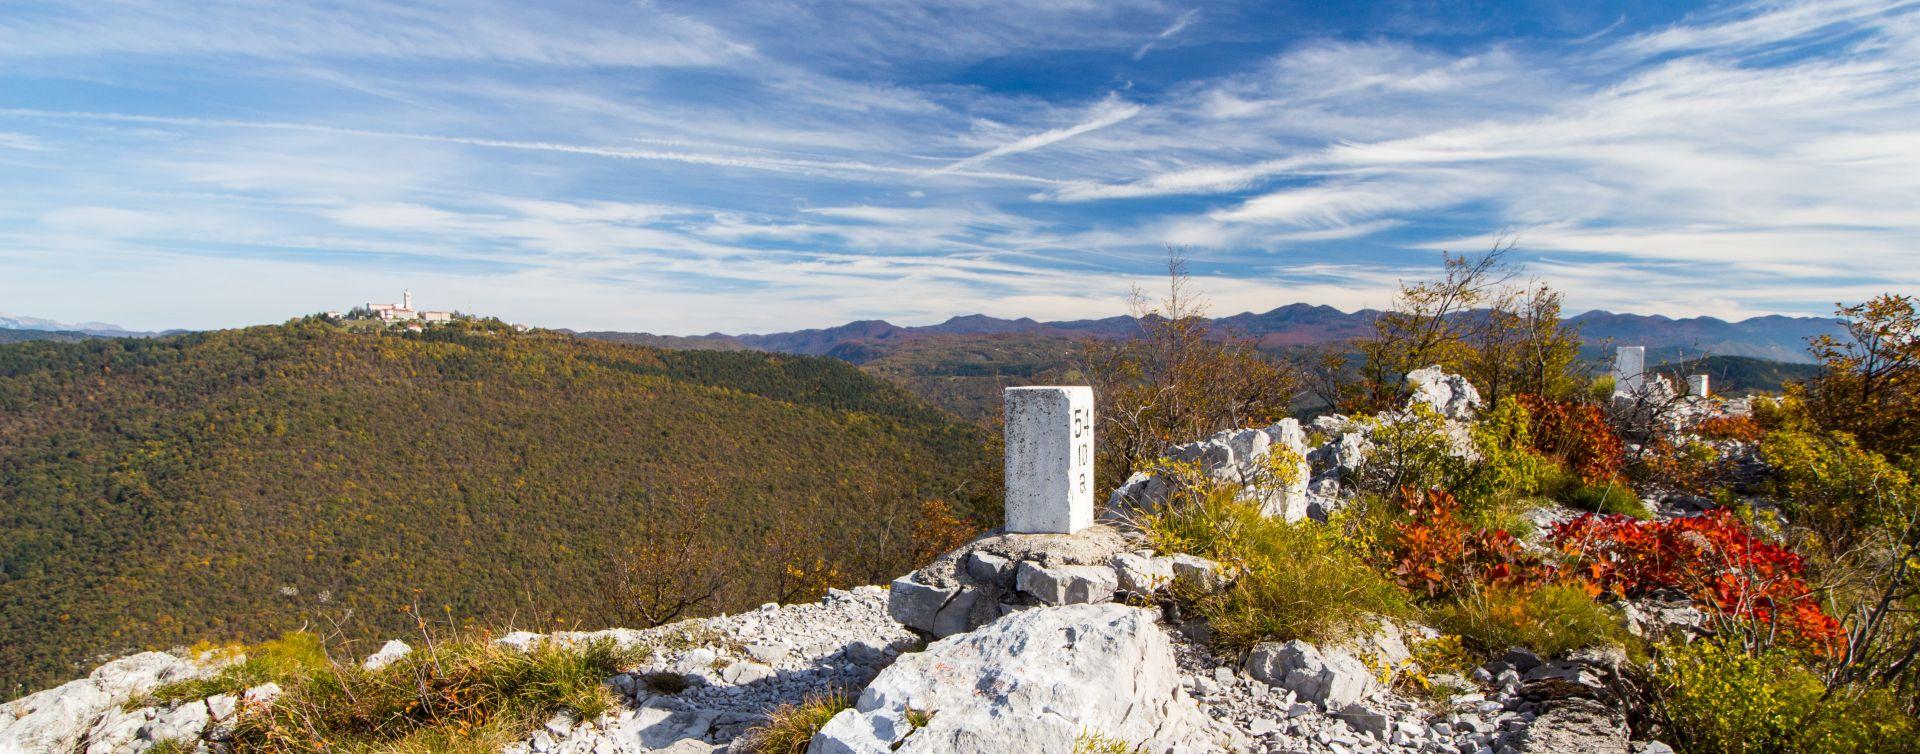 hike sabotin slovenia